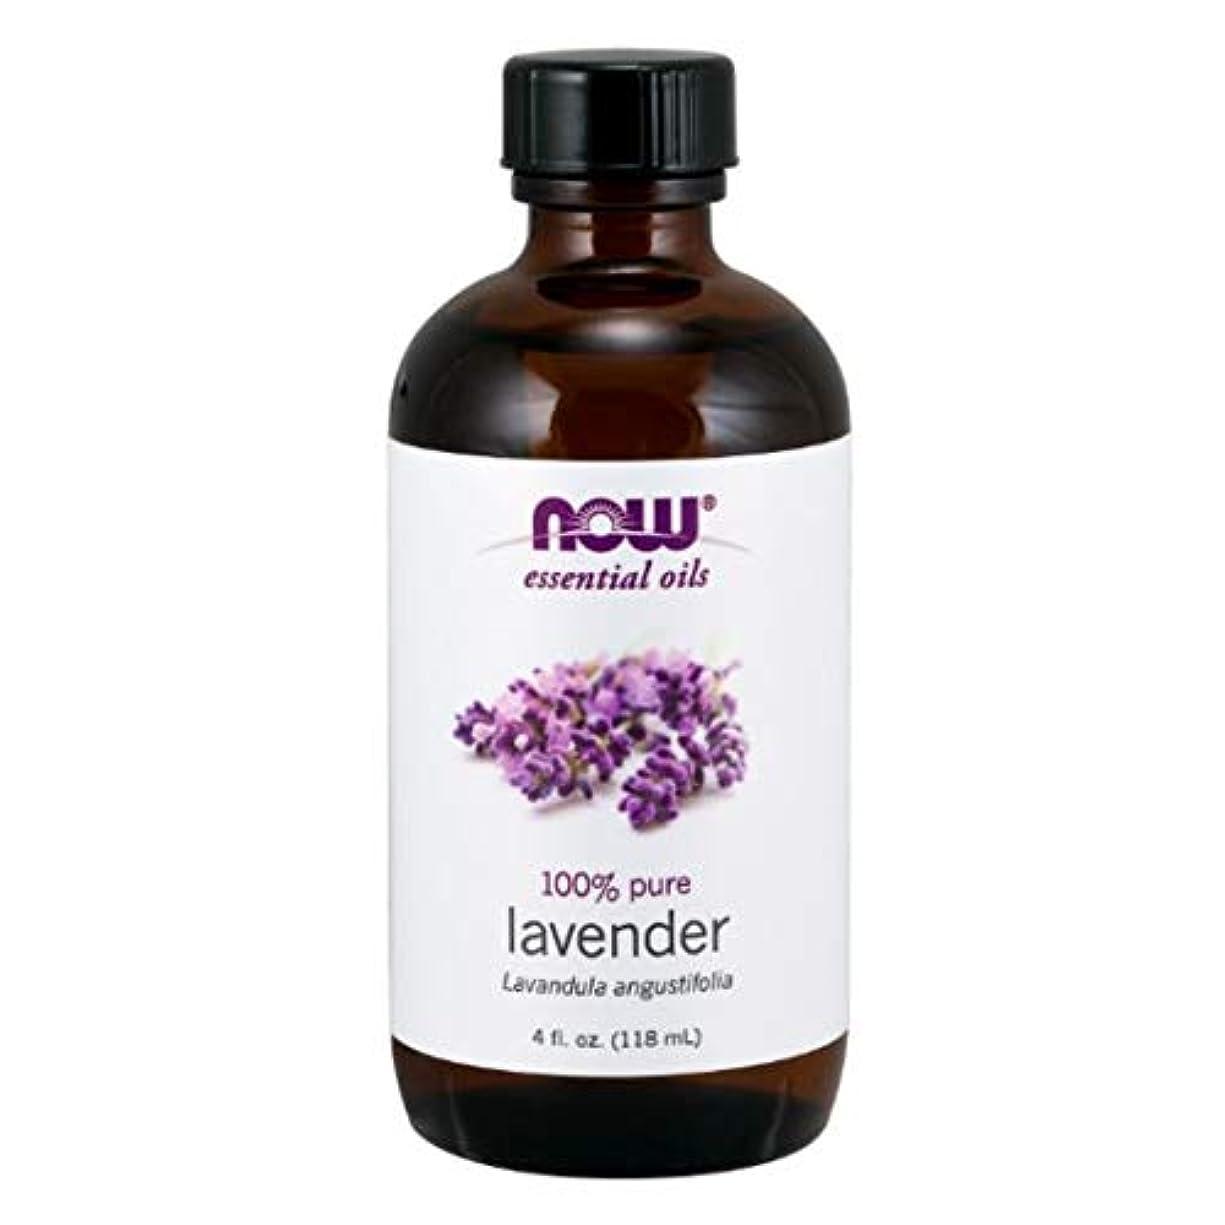 作家ピュー権限Now - Lavender Oil 100% Pure 4 oz (118 ml) [並行輸入品]